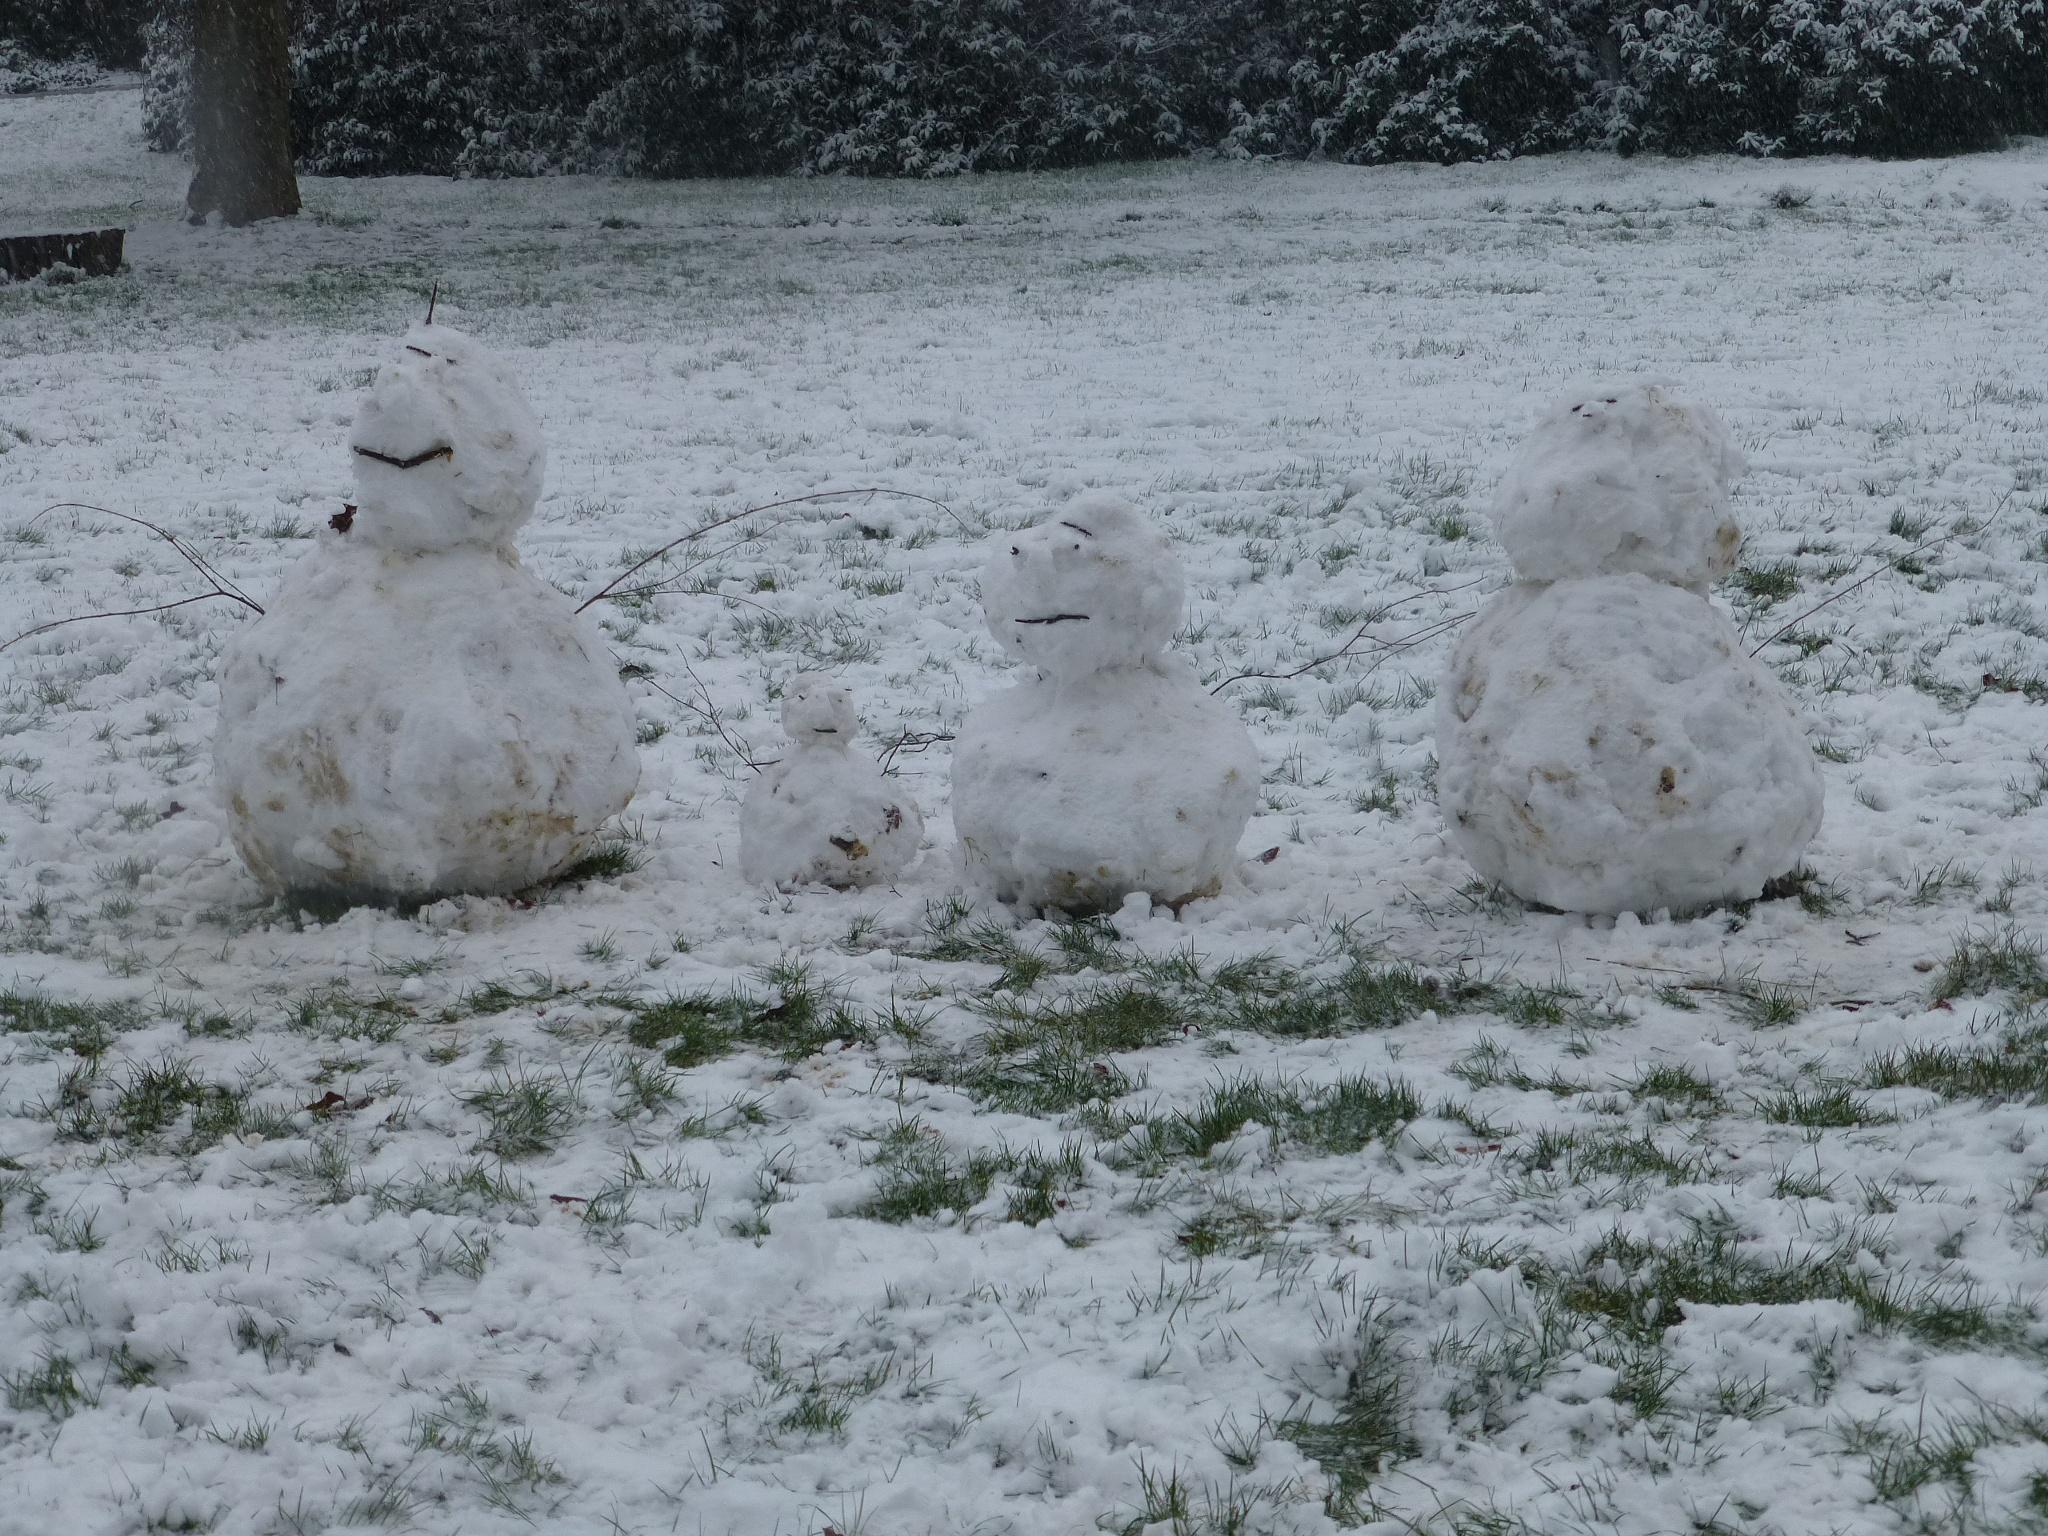 Snow men or snow family by Mo Dessouki